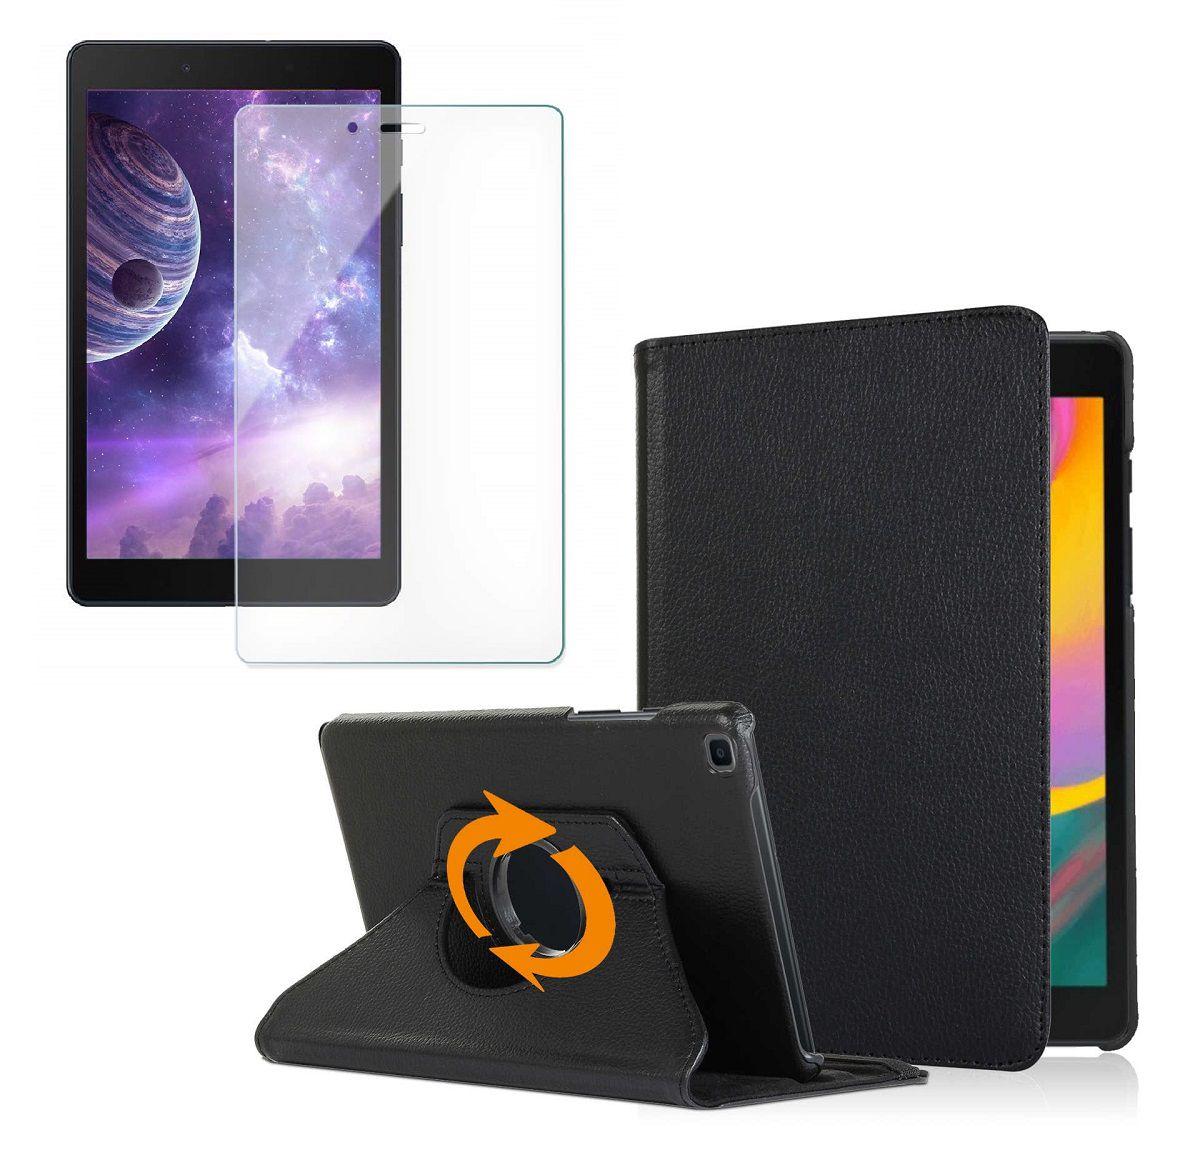 Kit Capa Tablet Samsung Galaxy Tab A 8 T290 T295 Executiva Giratória + Película de Vidro